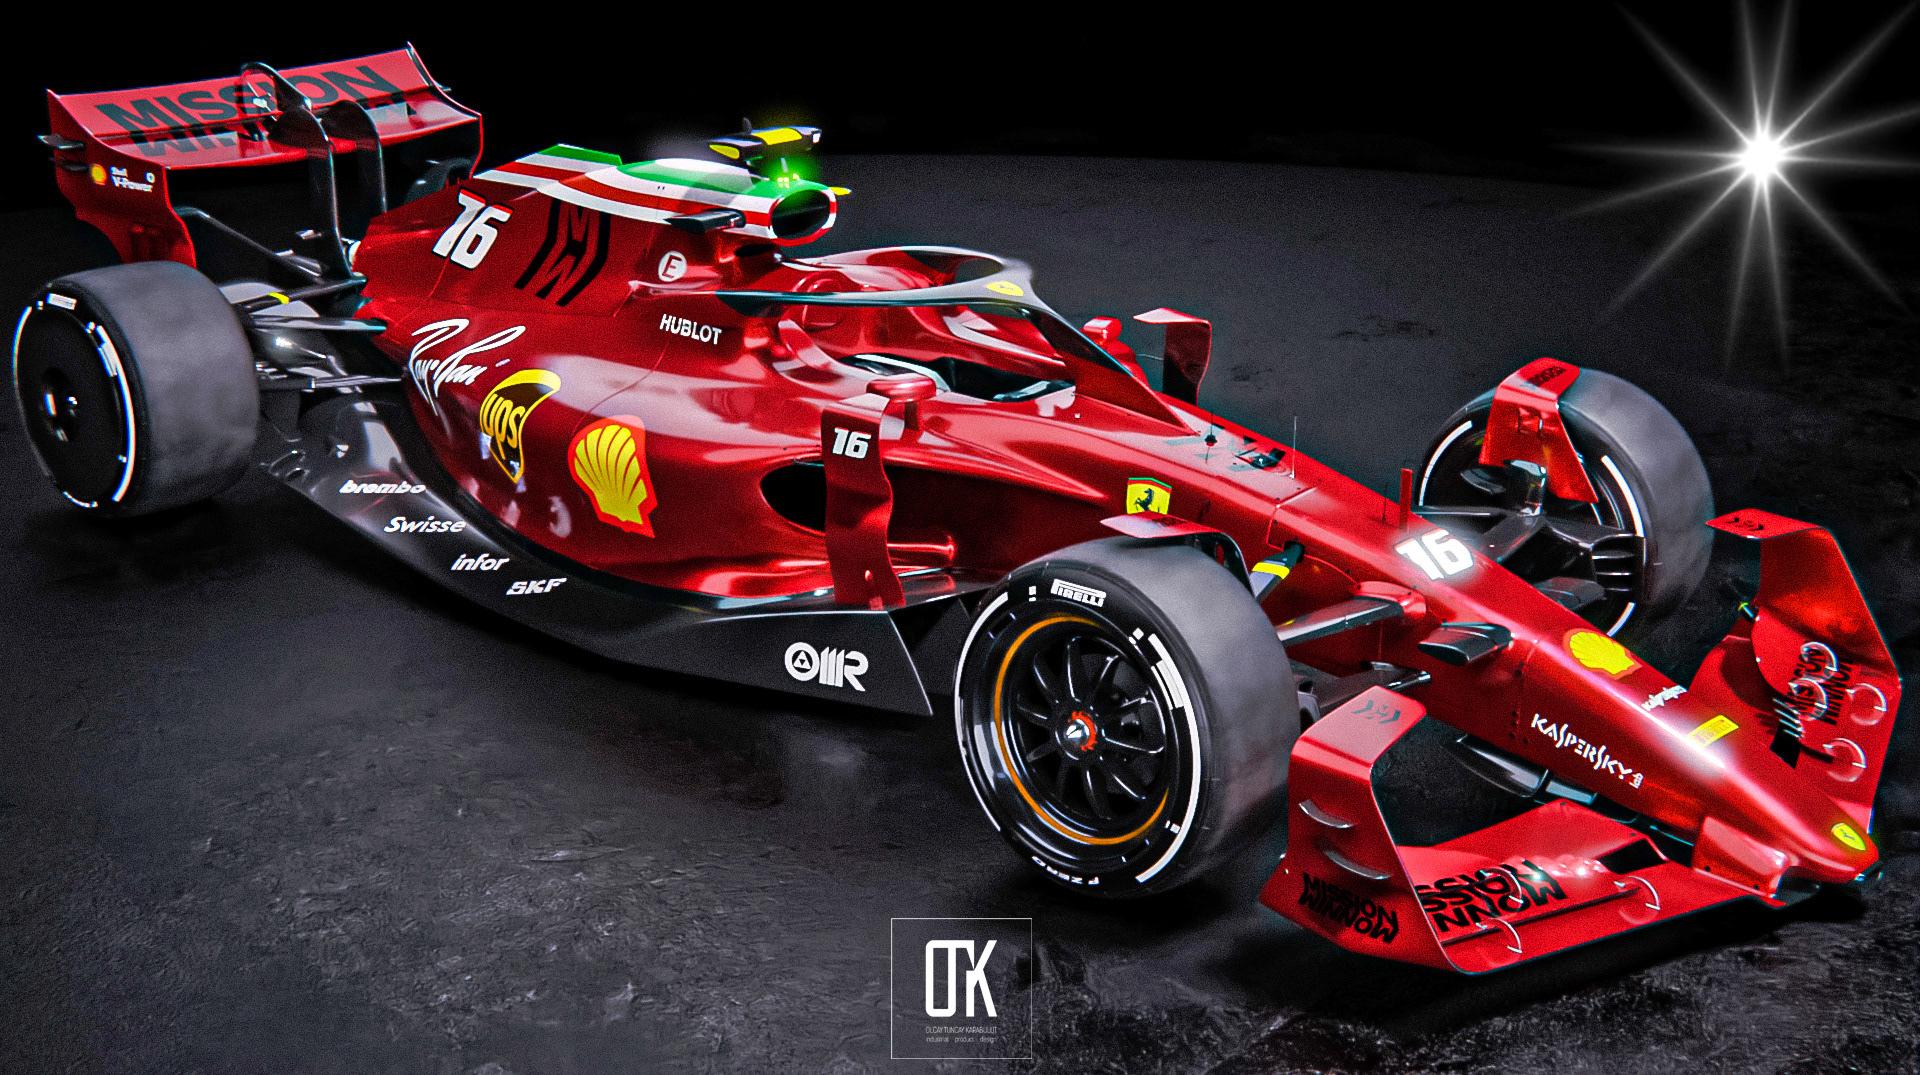 Scuderia Ferrari 2022 Concept on Behance